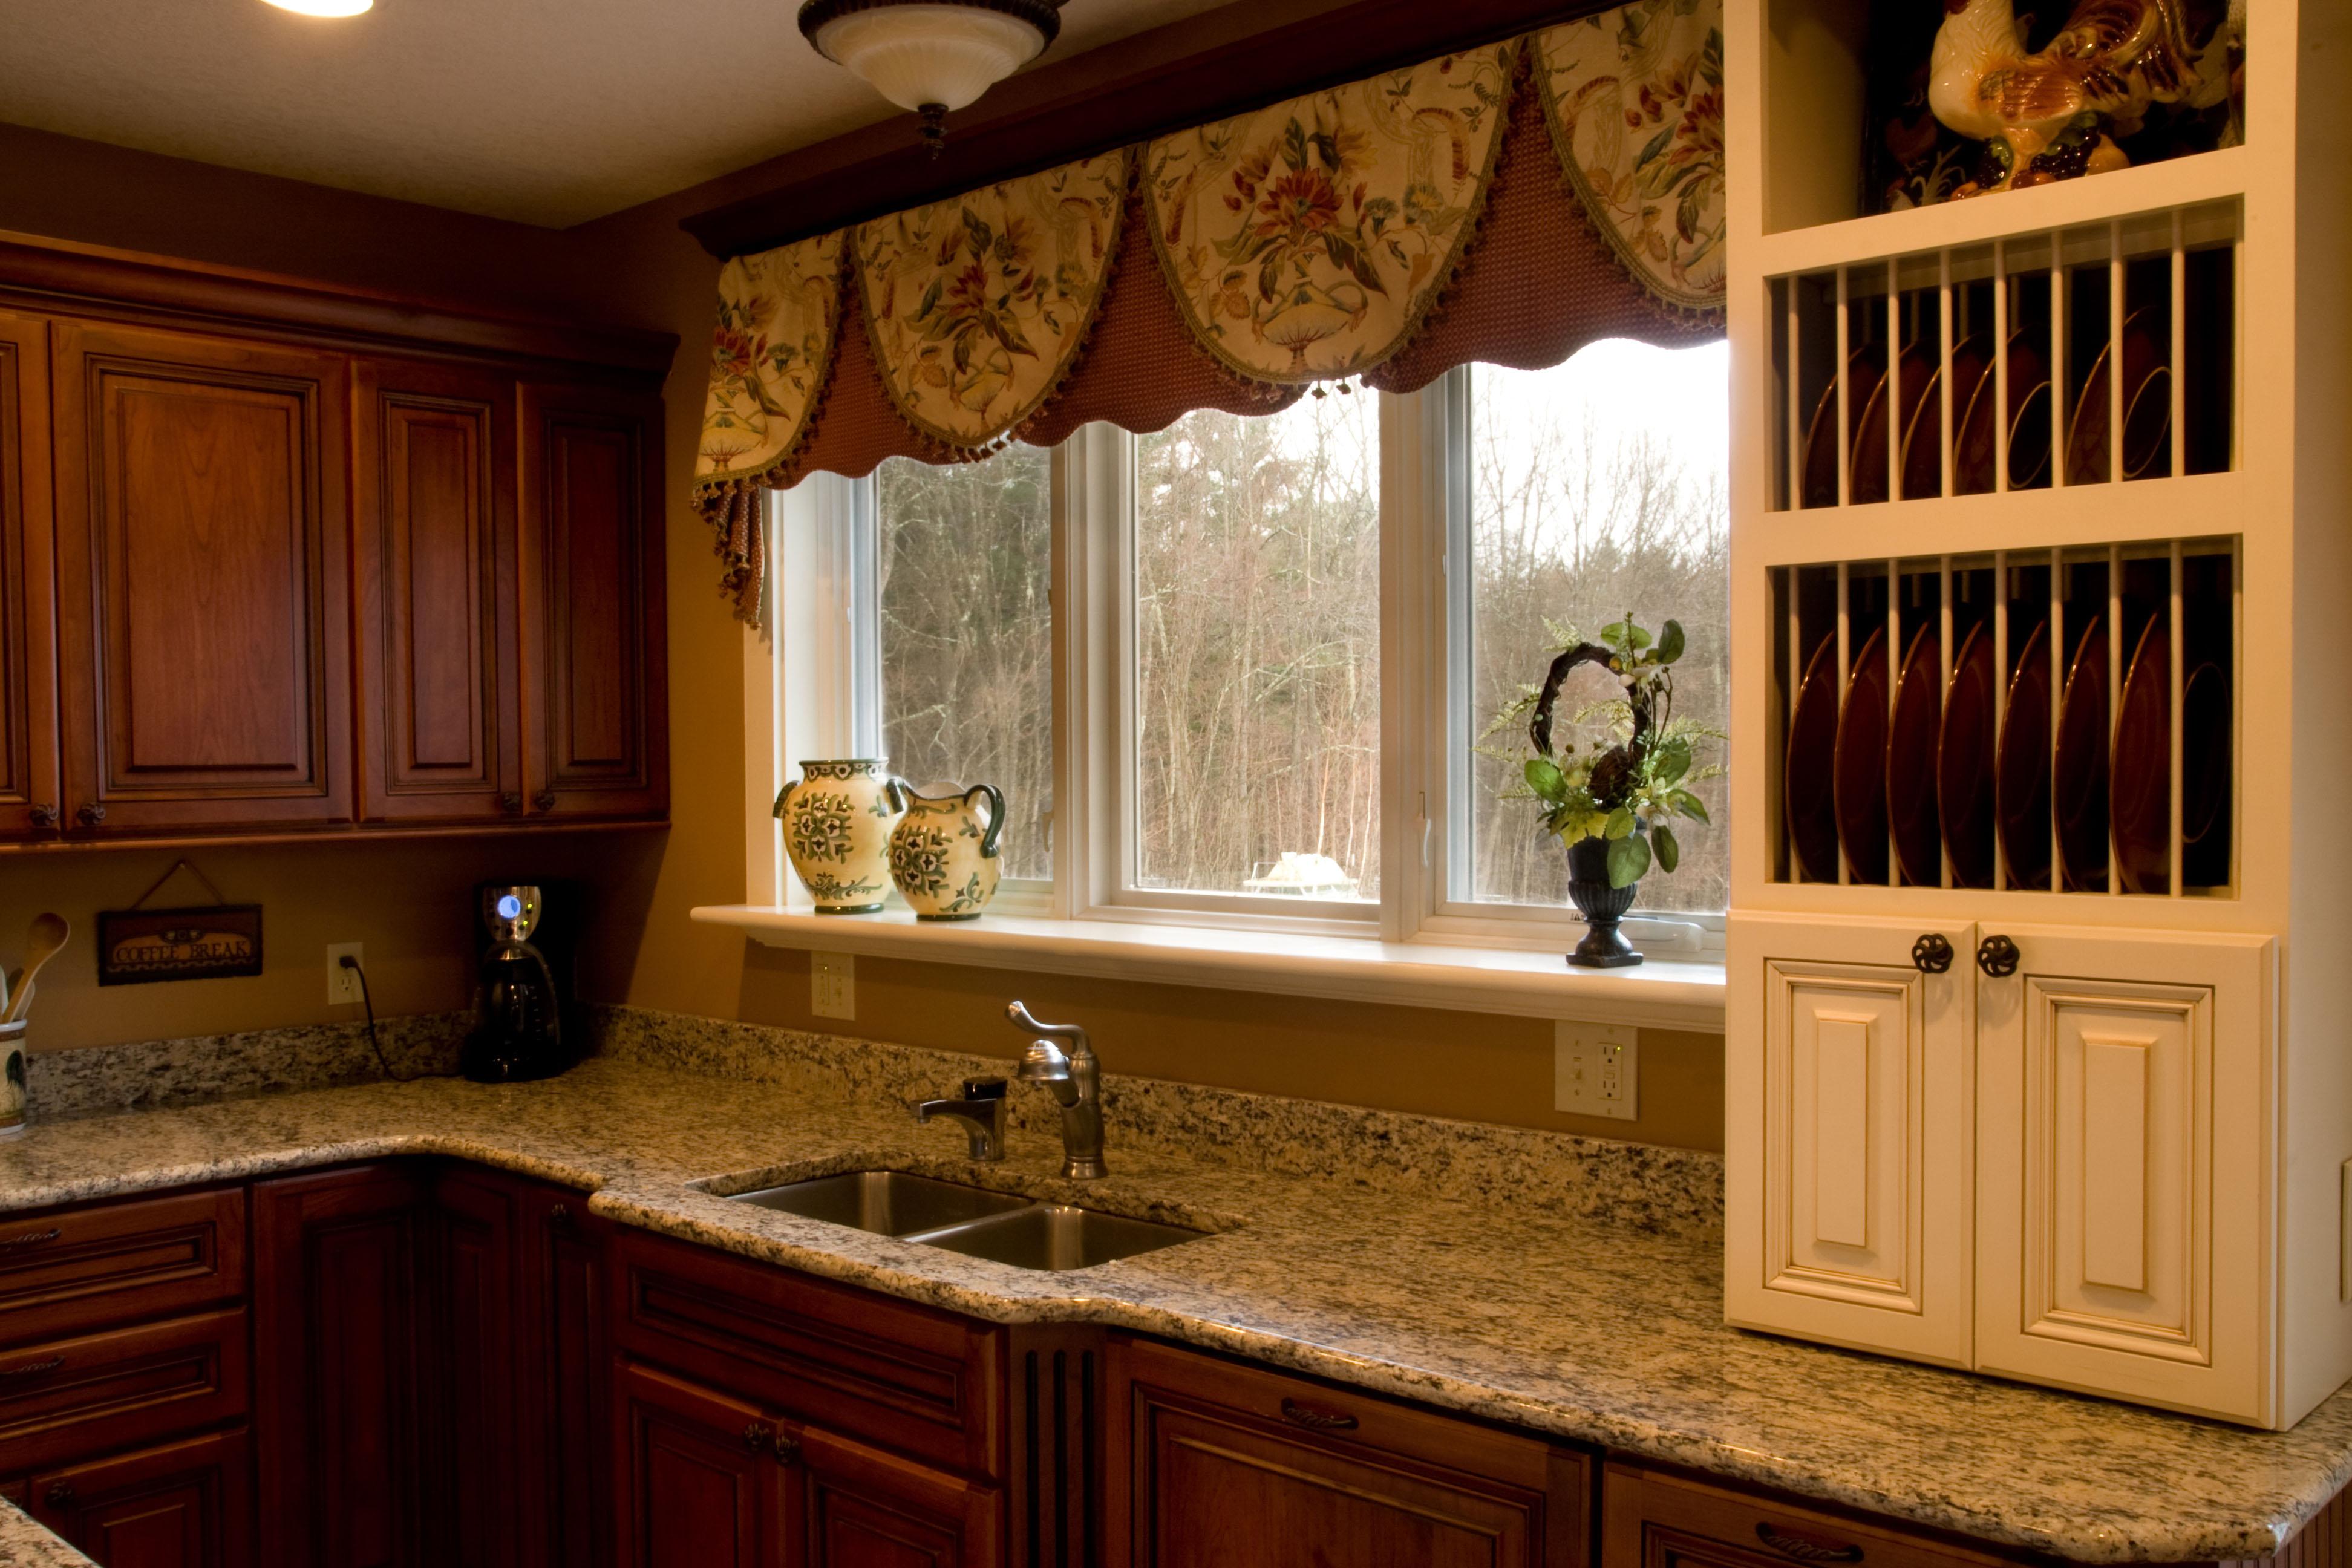 Plaid kitchen curtains photo - 1